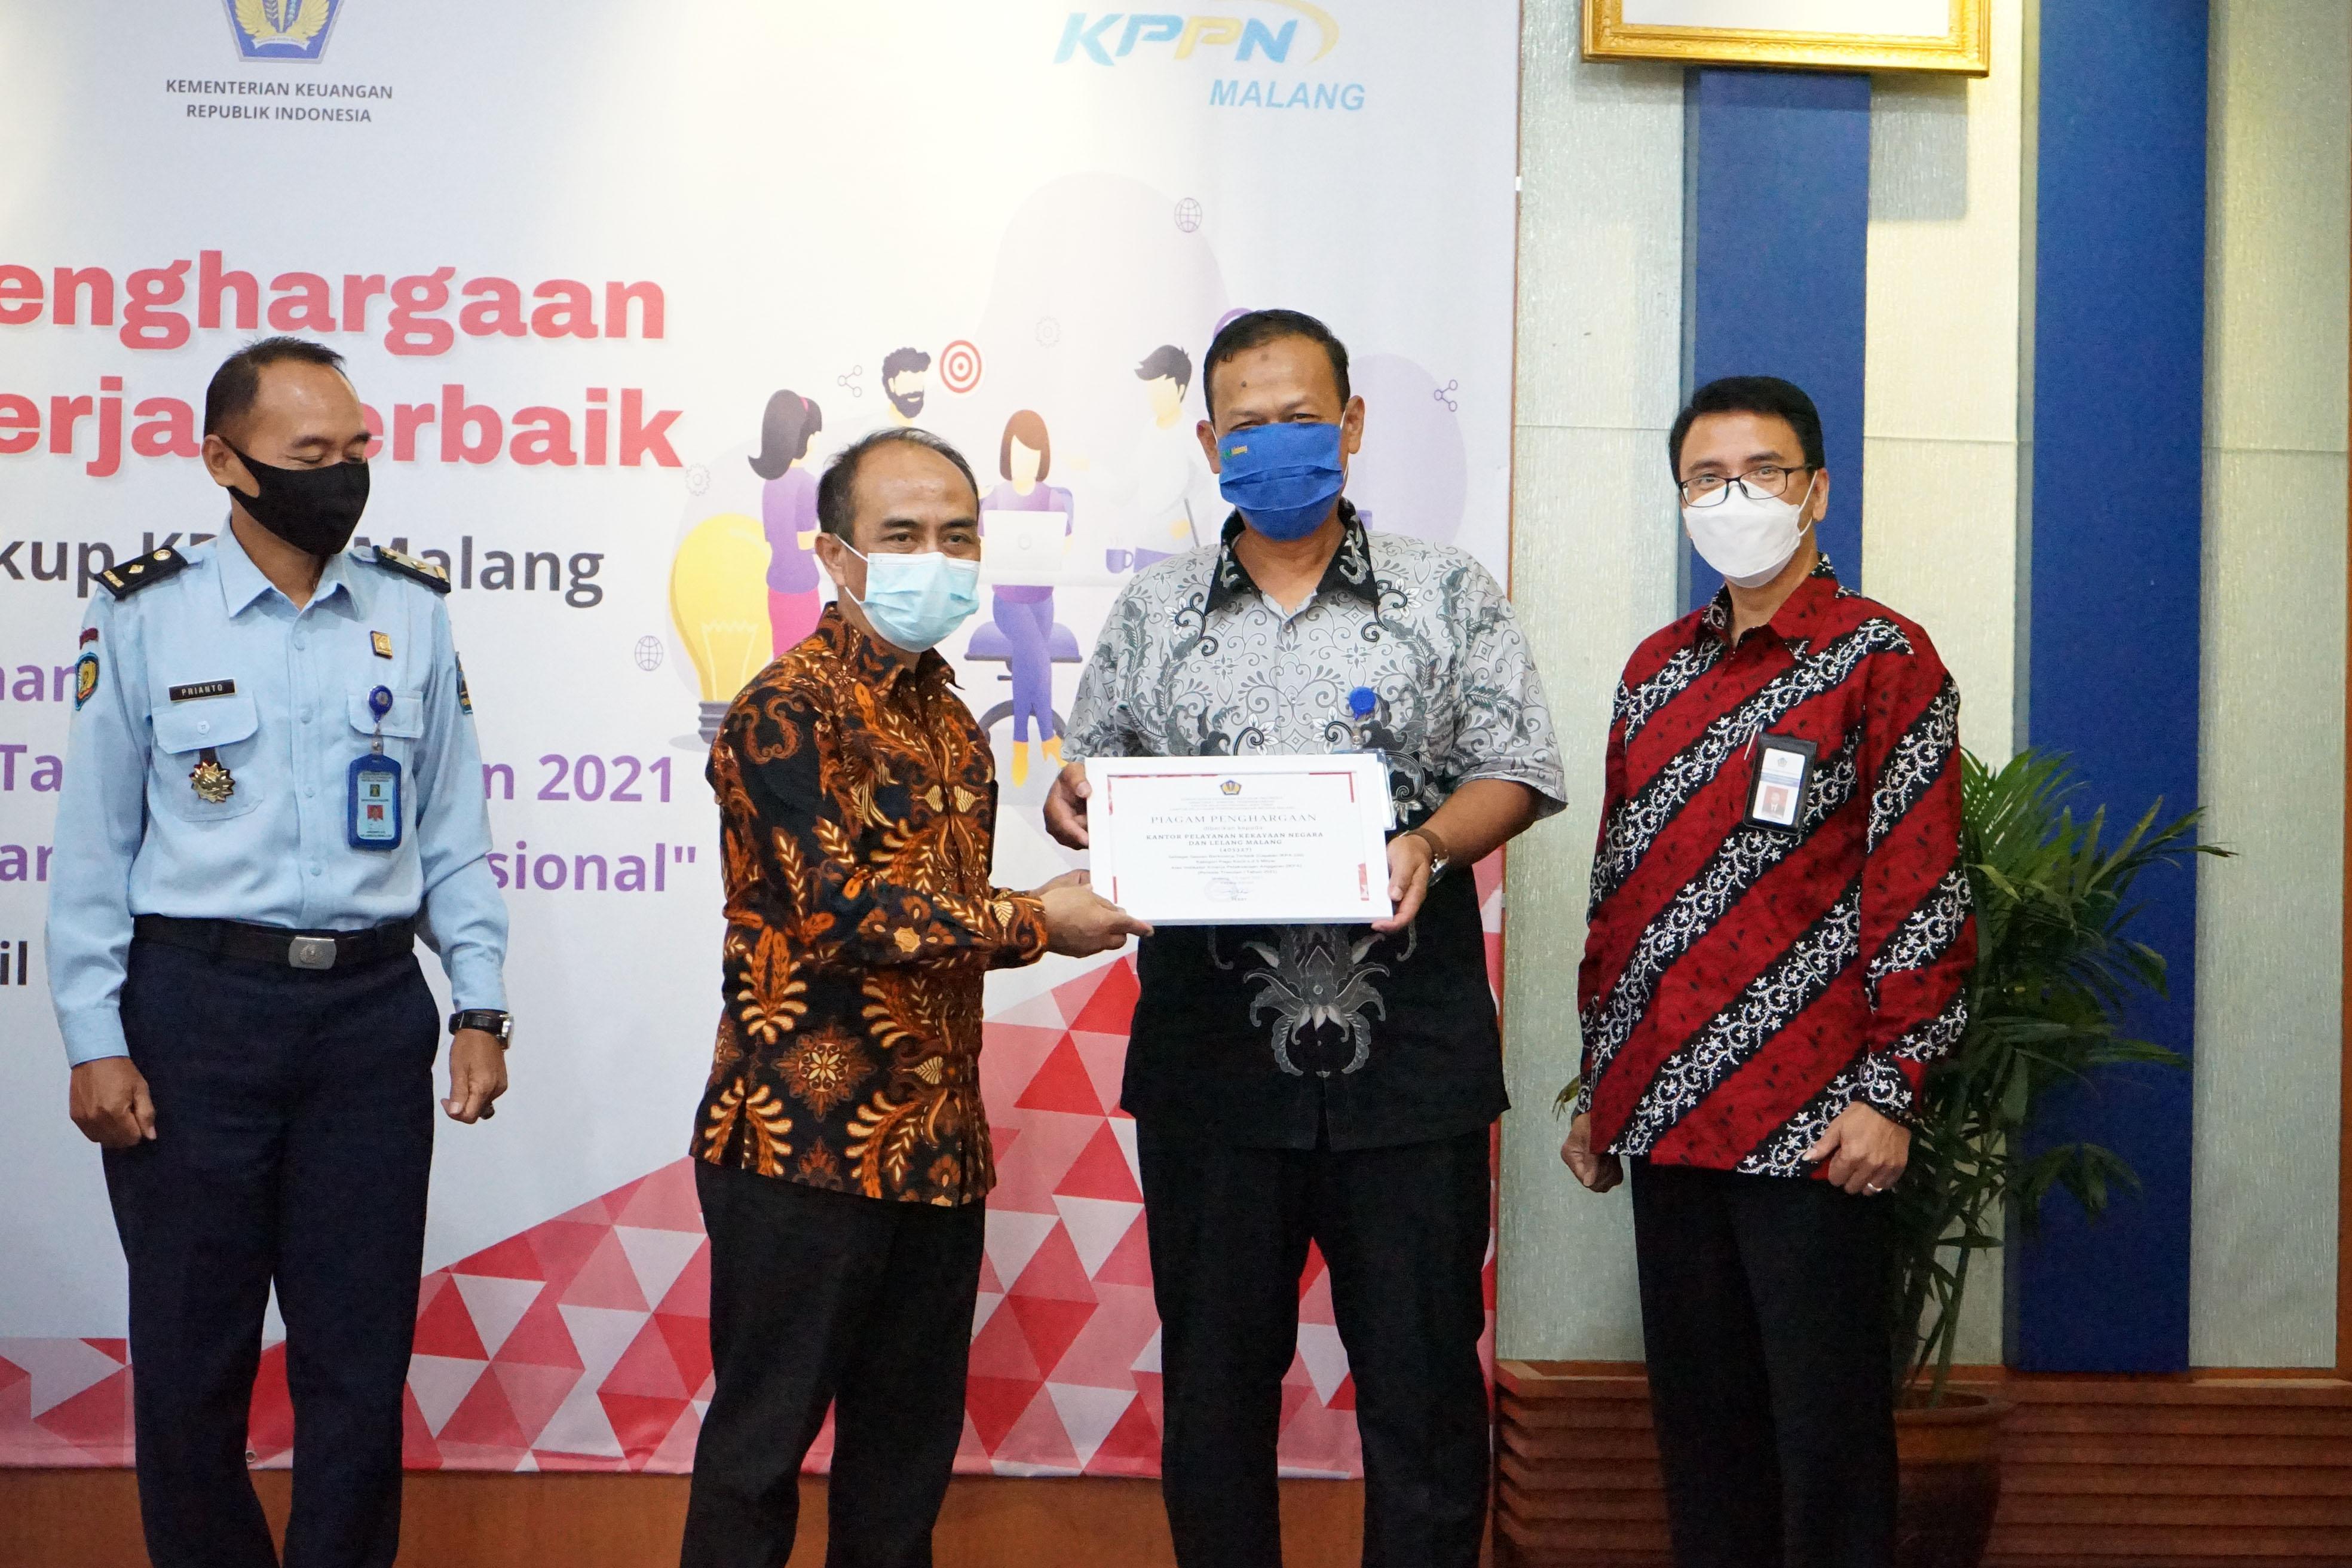 KPKNL Malang Raih Penghargaan PRISMA Periode Triwulan I Tahun 2021